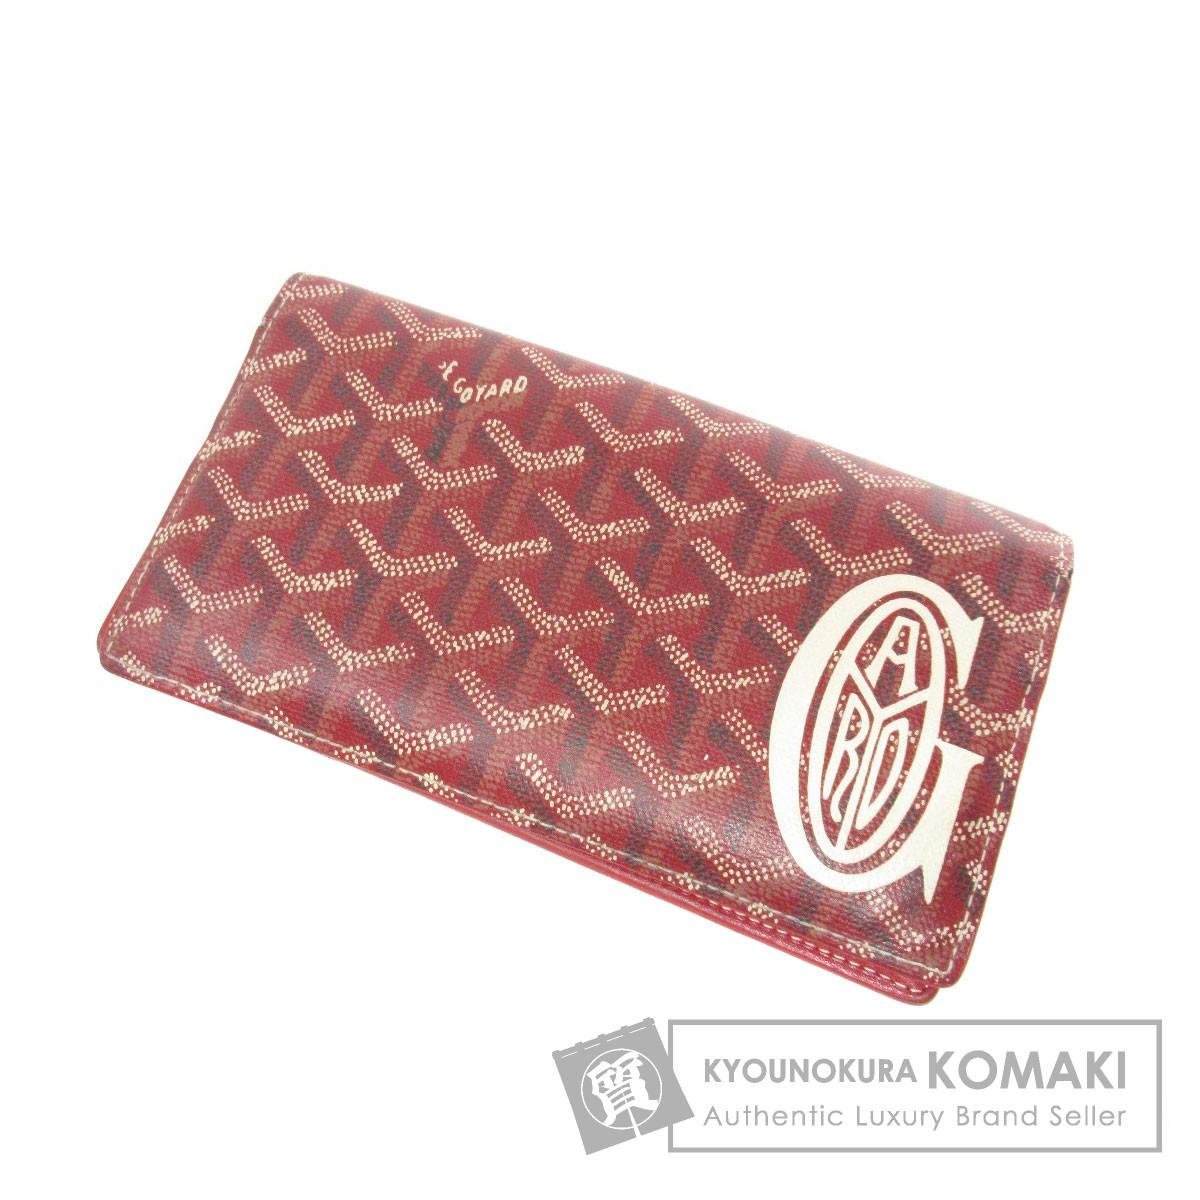 GOYARD ロゴモチーフ 長財布(小銭入れあり) レザー レディース 【中古】【ゴヤール】